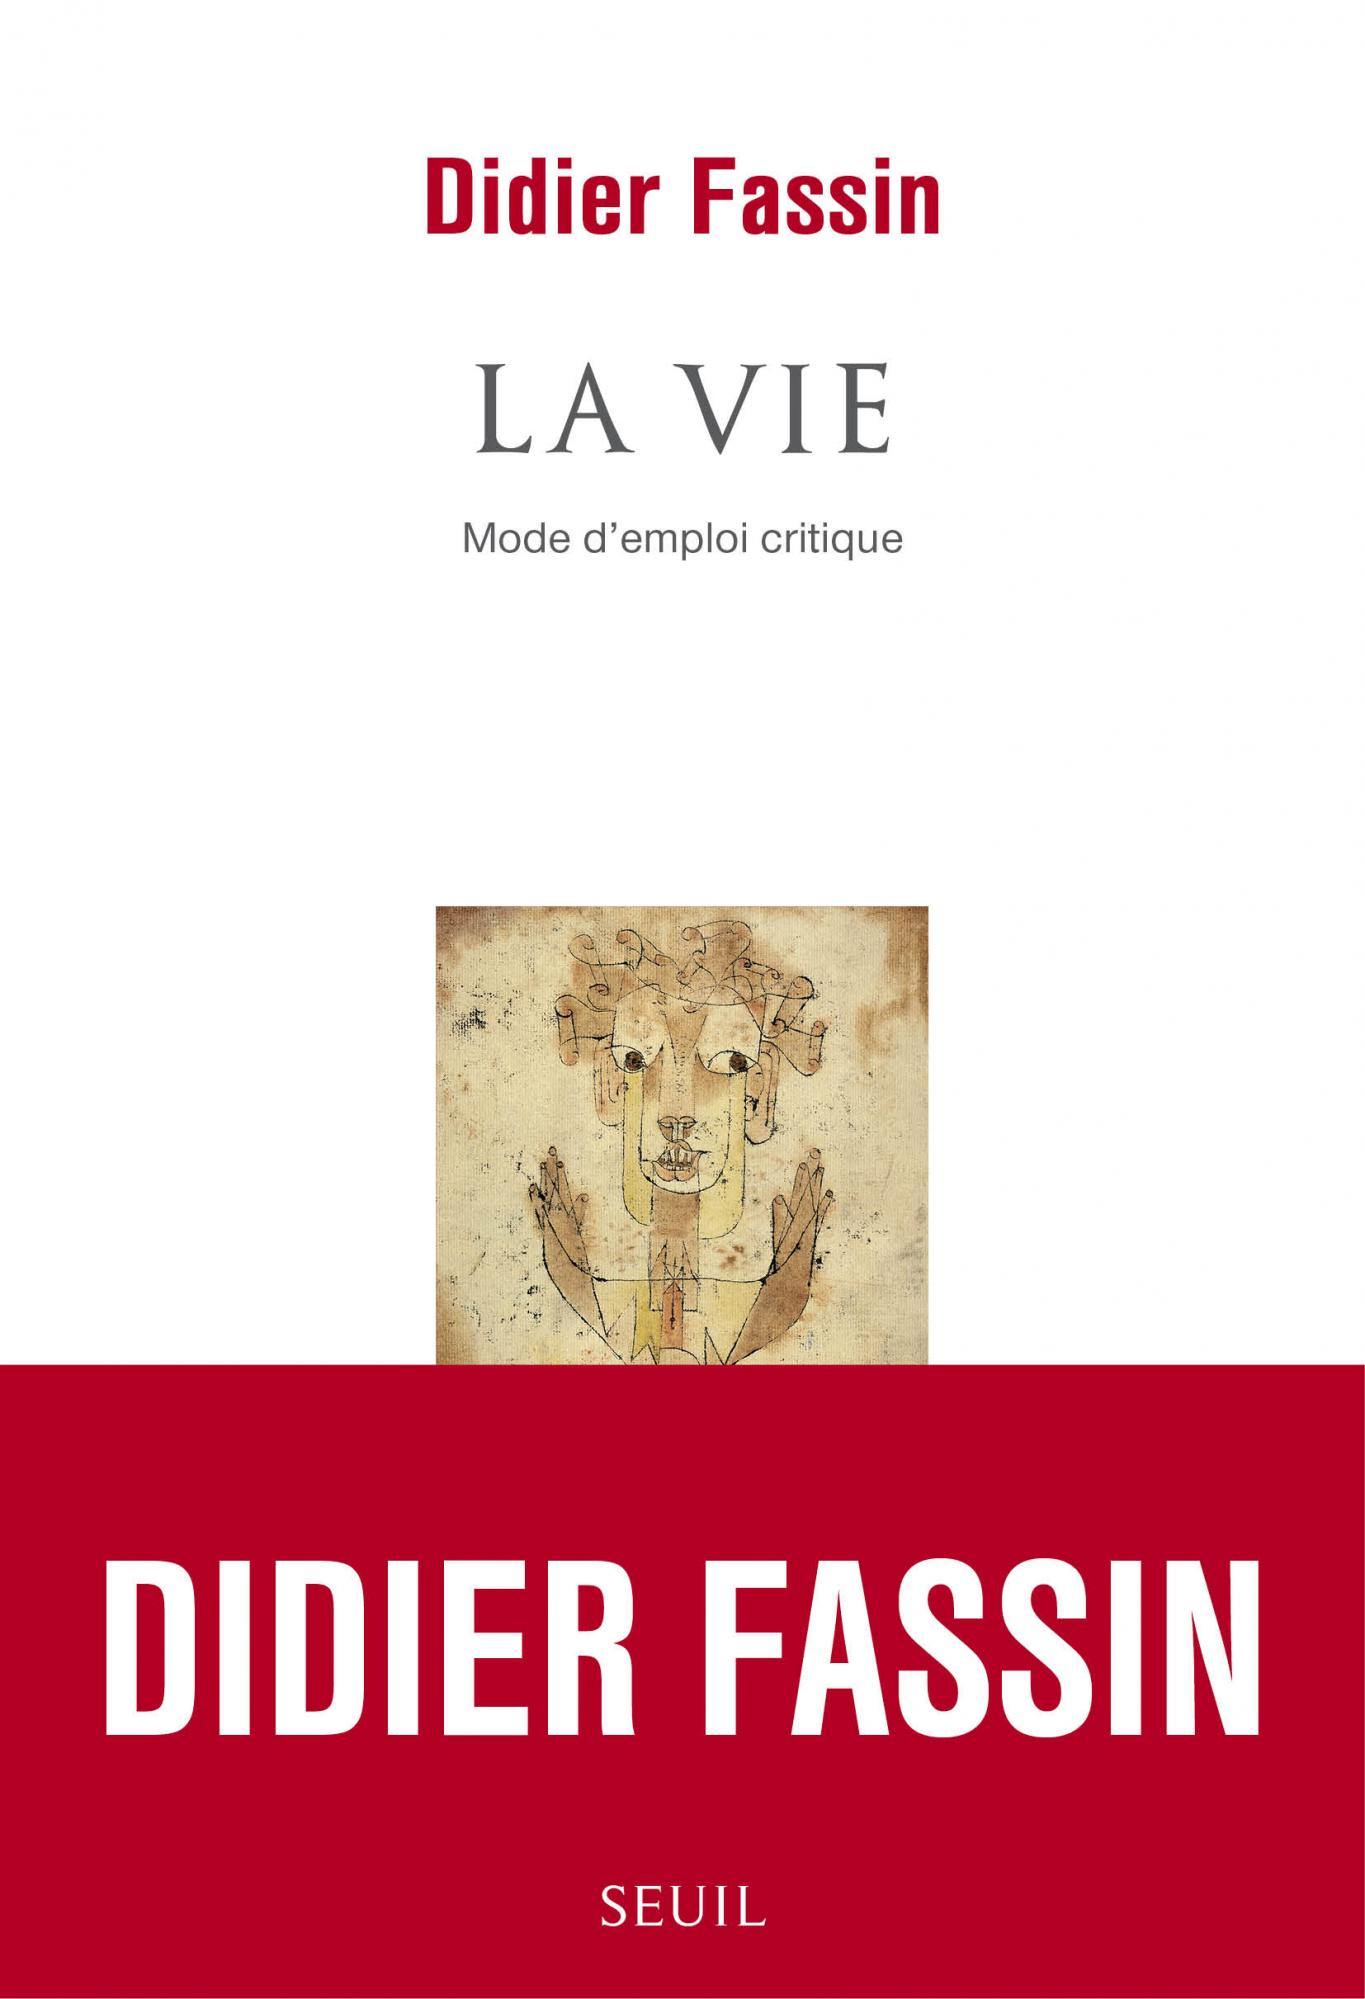 D. Fassin, <em>La Vie. Mode d'emploi critique</em> en libre accès